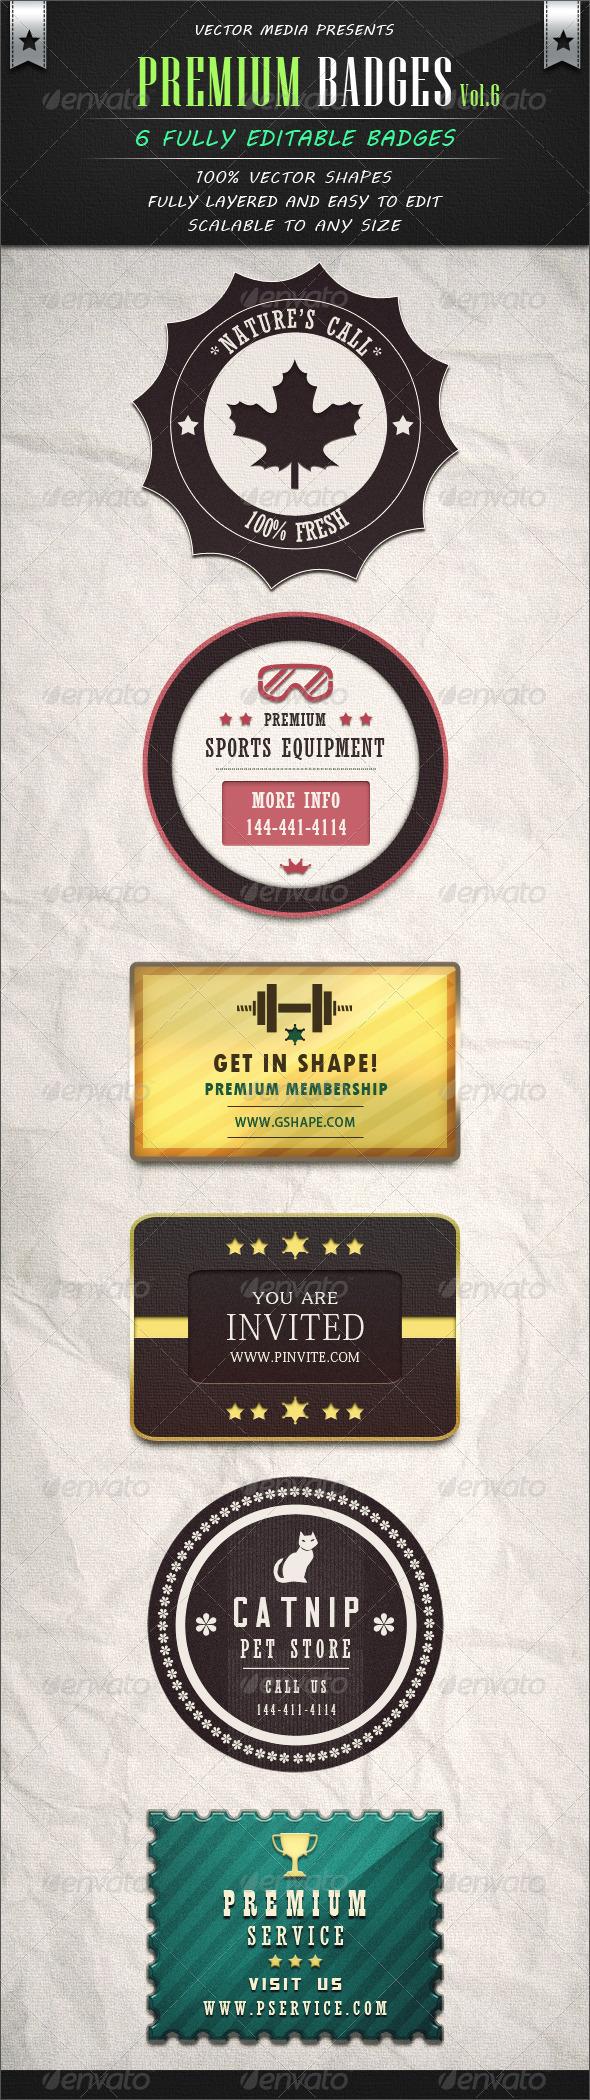 Premium Badges - Vol.6 - Badges & Stickers Web Elements